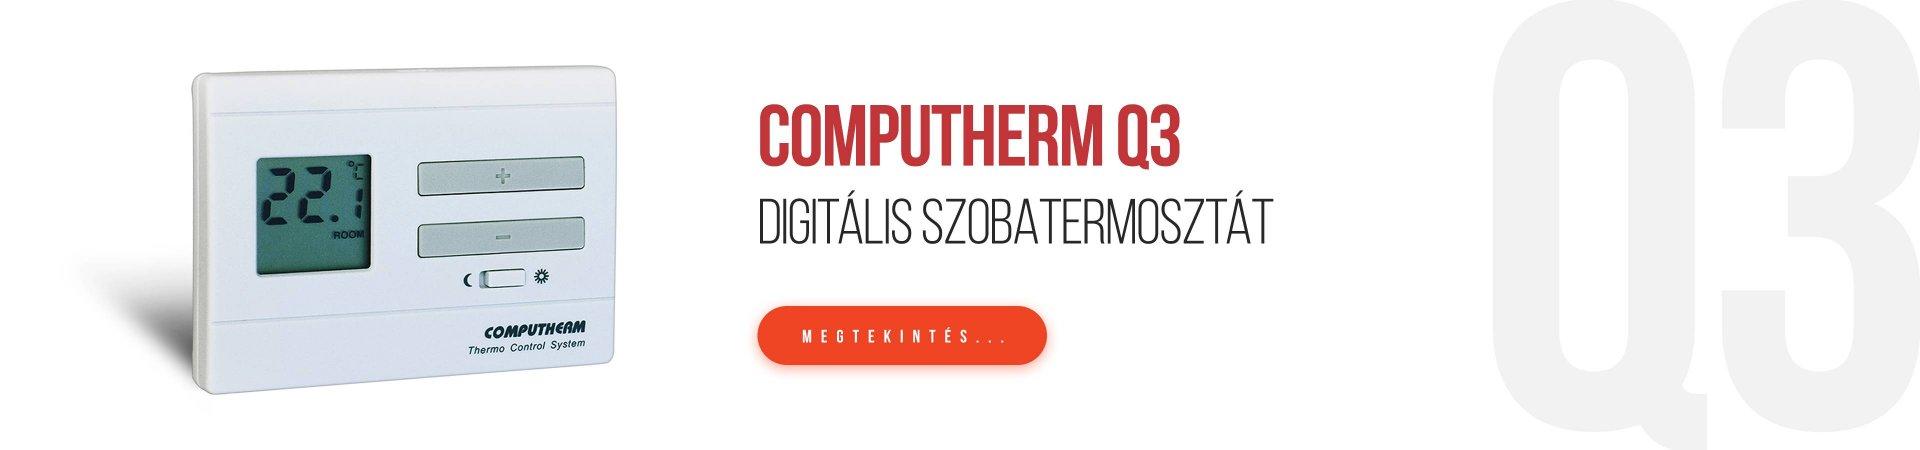 http://www.termostatshop.sk/hu/digitalis-szobatermosztat